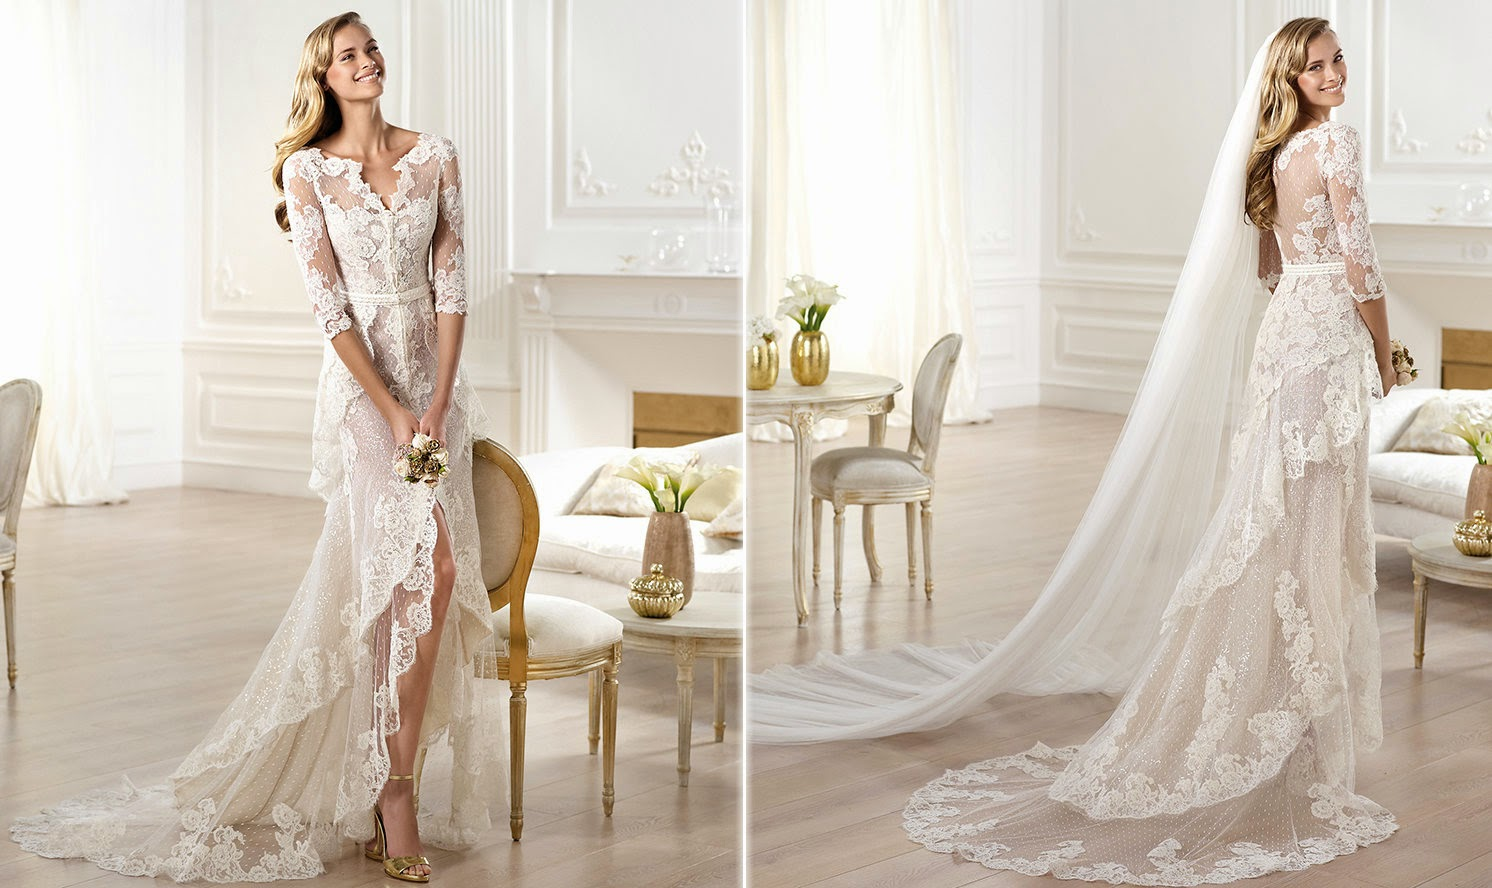 Yaela Wedding Dress For  : Wedding dress collection pronovias dresses